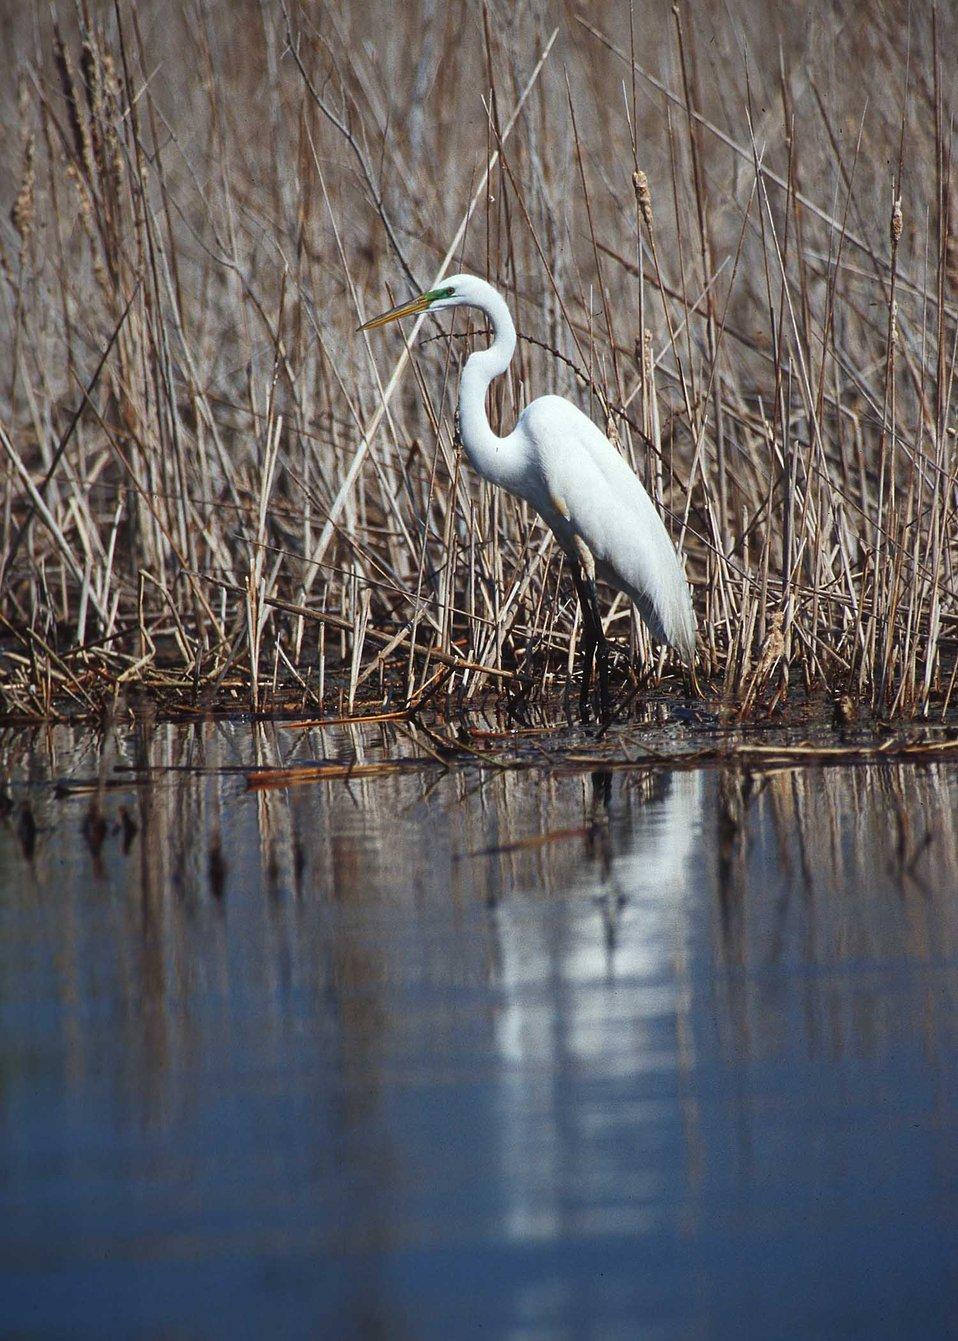 Great egret in the prairie pothole region of South Dakota.